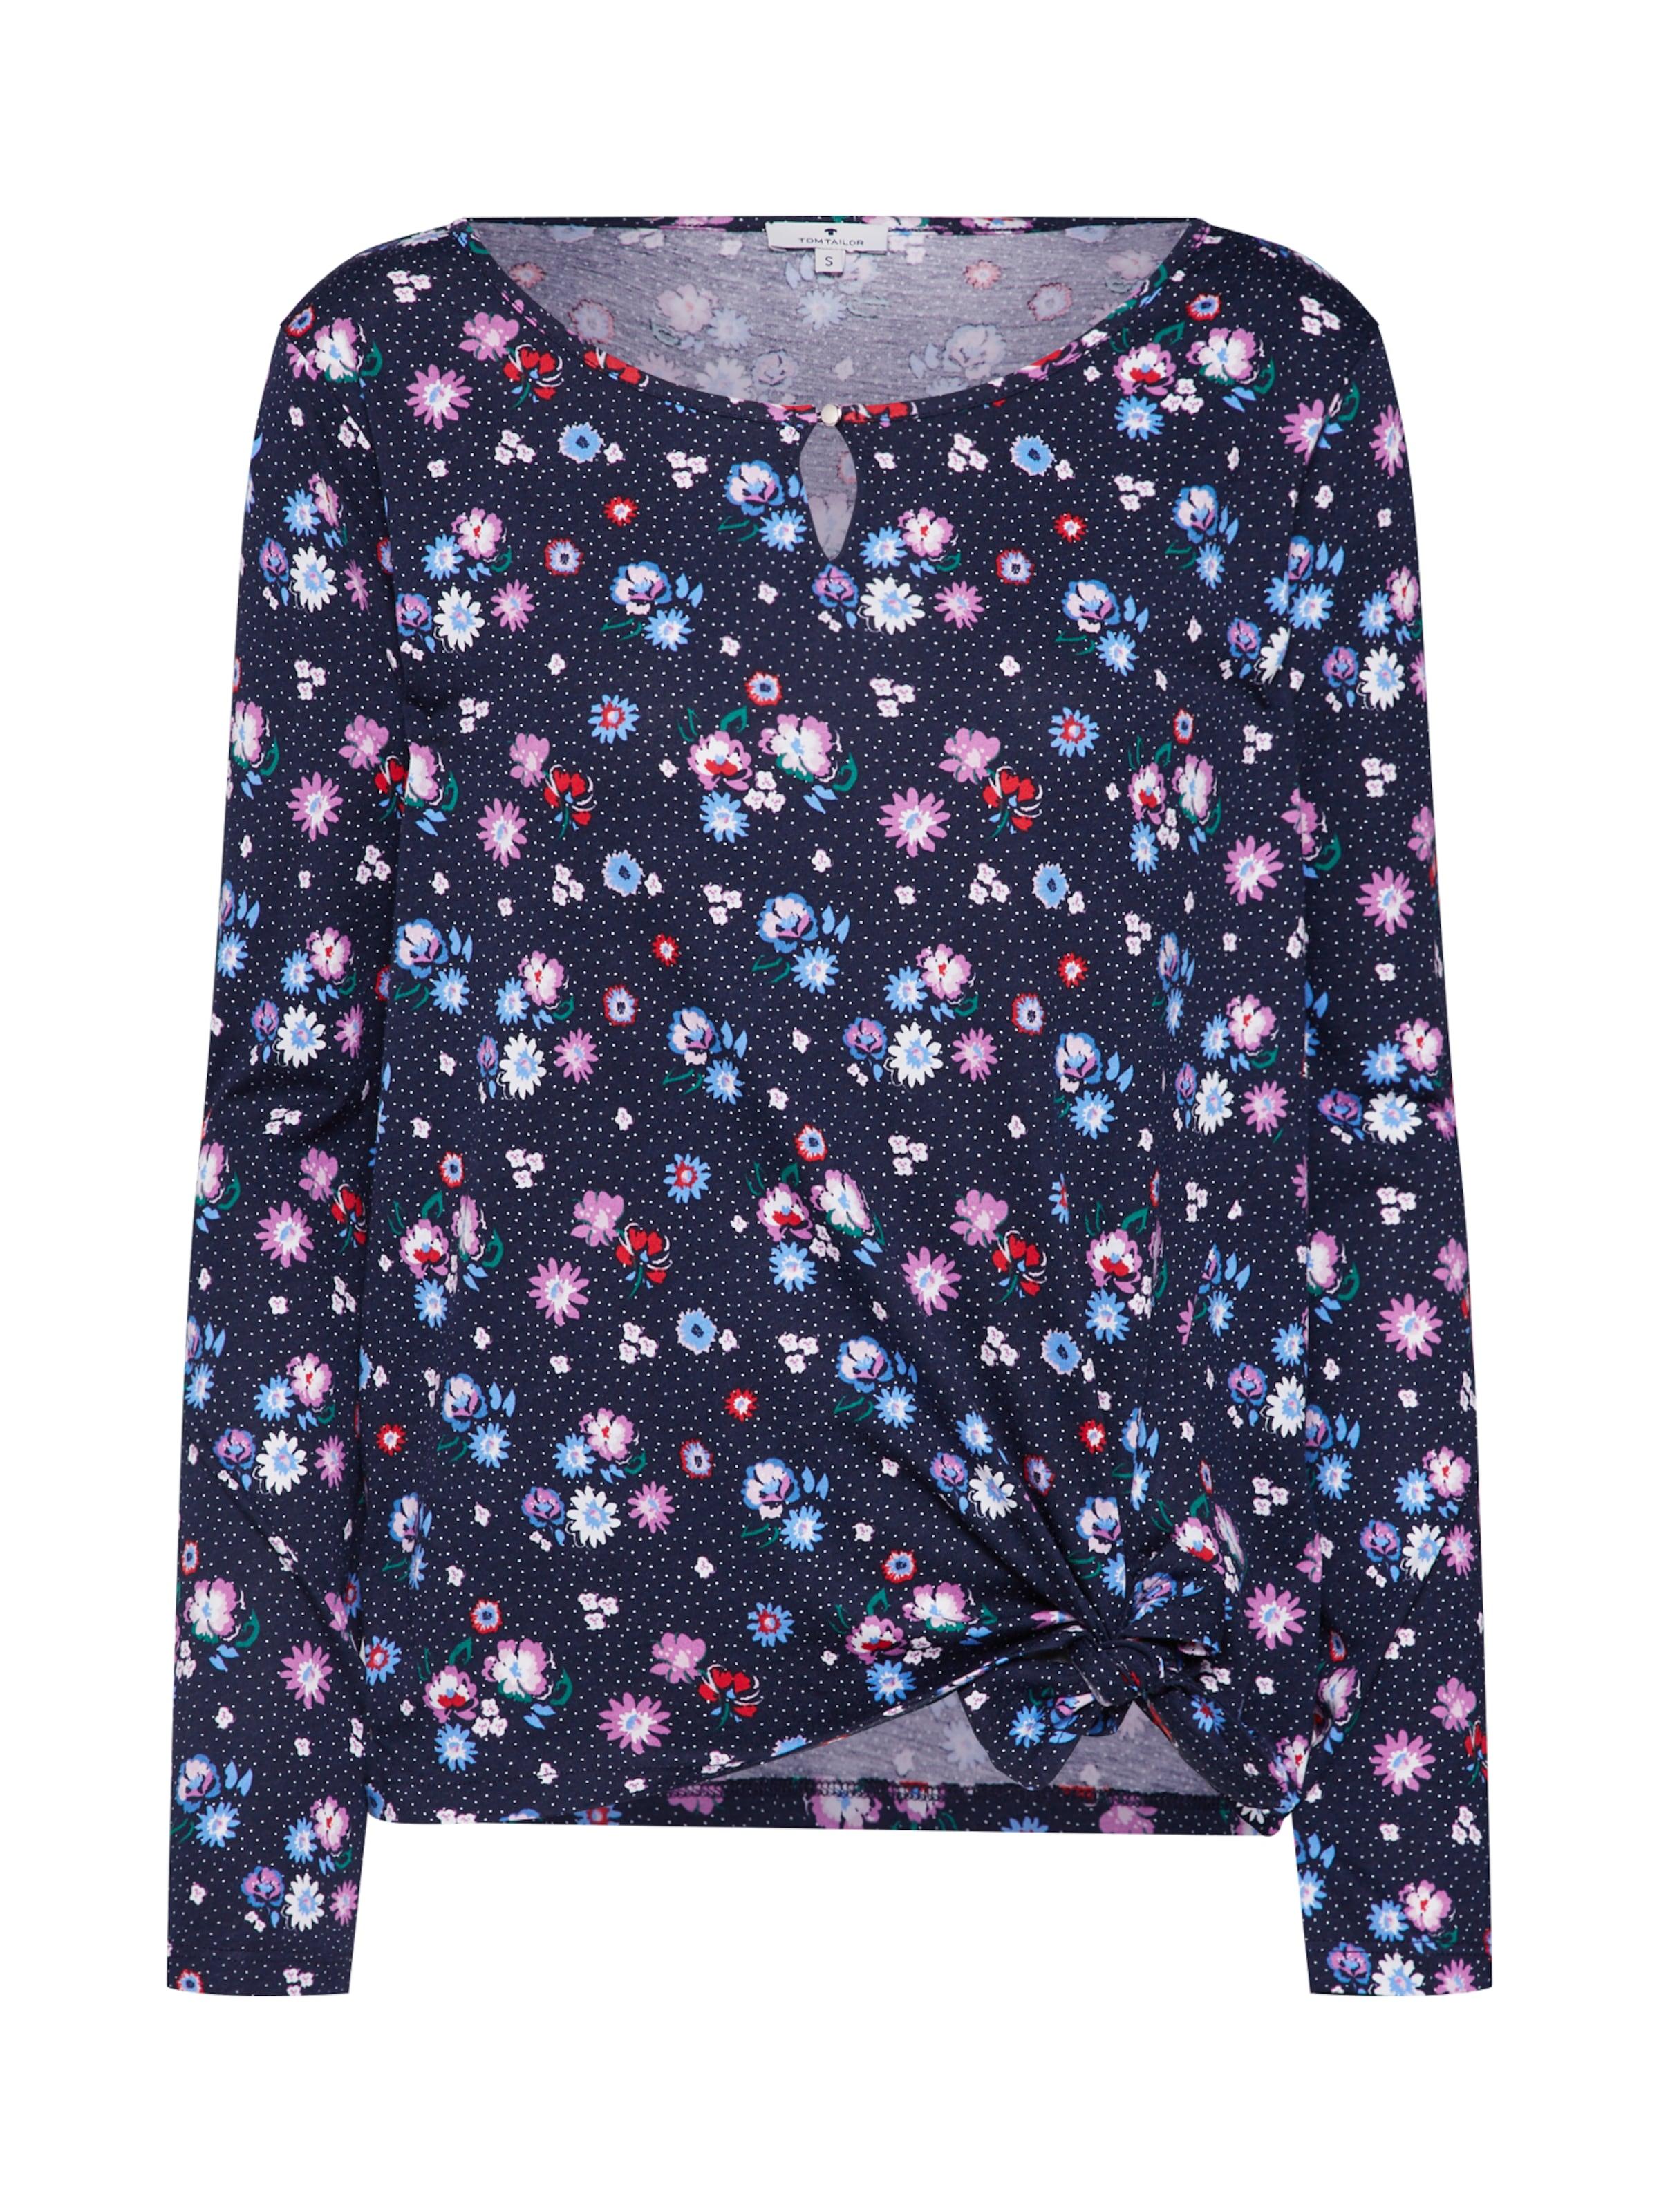 Canneberge T Tom En Tailor shirt MarineClair Blanc Bleu Violet sQdhrt